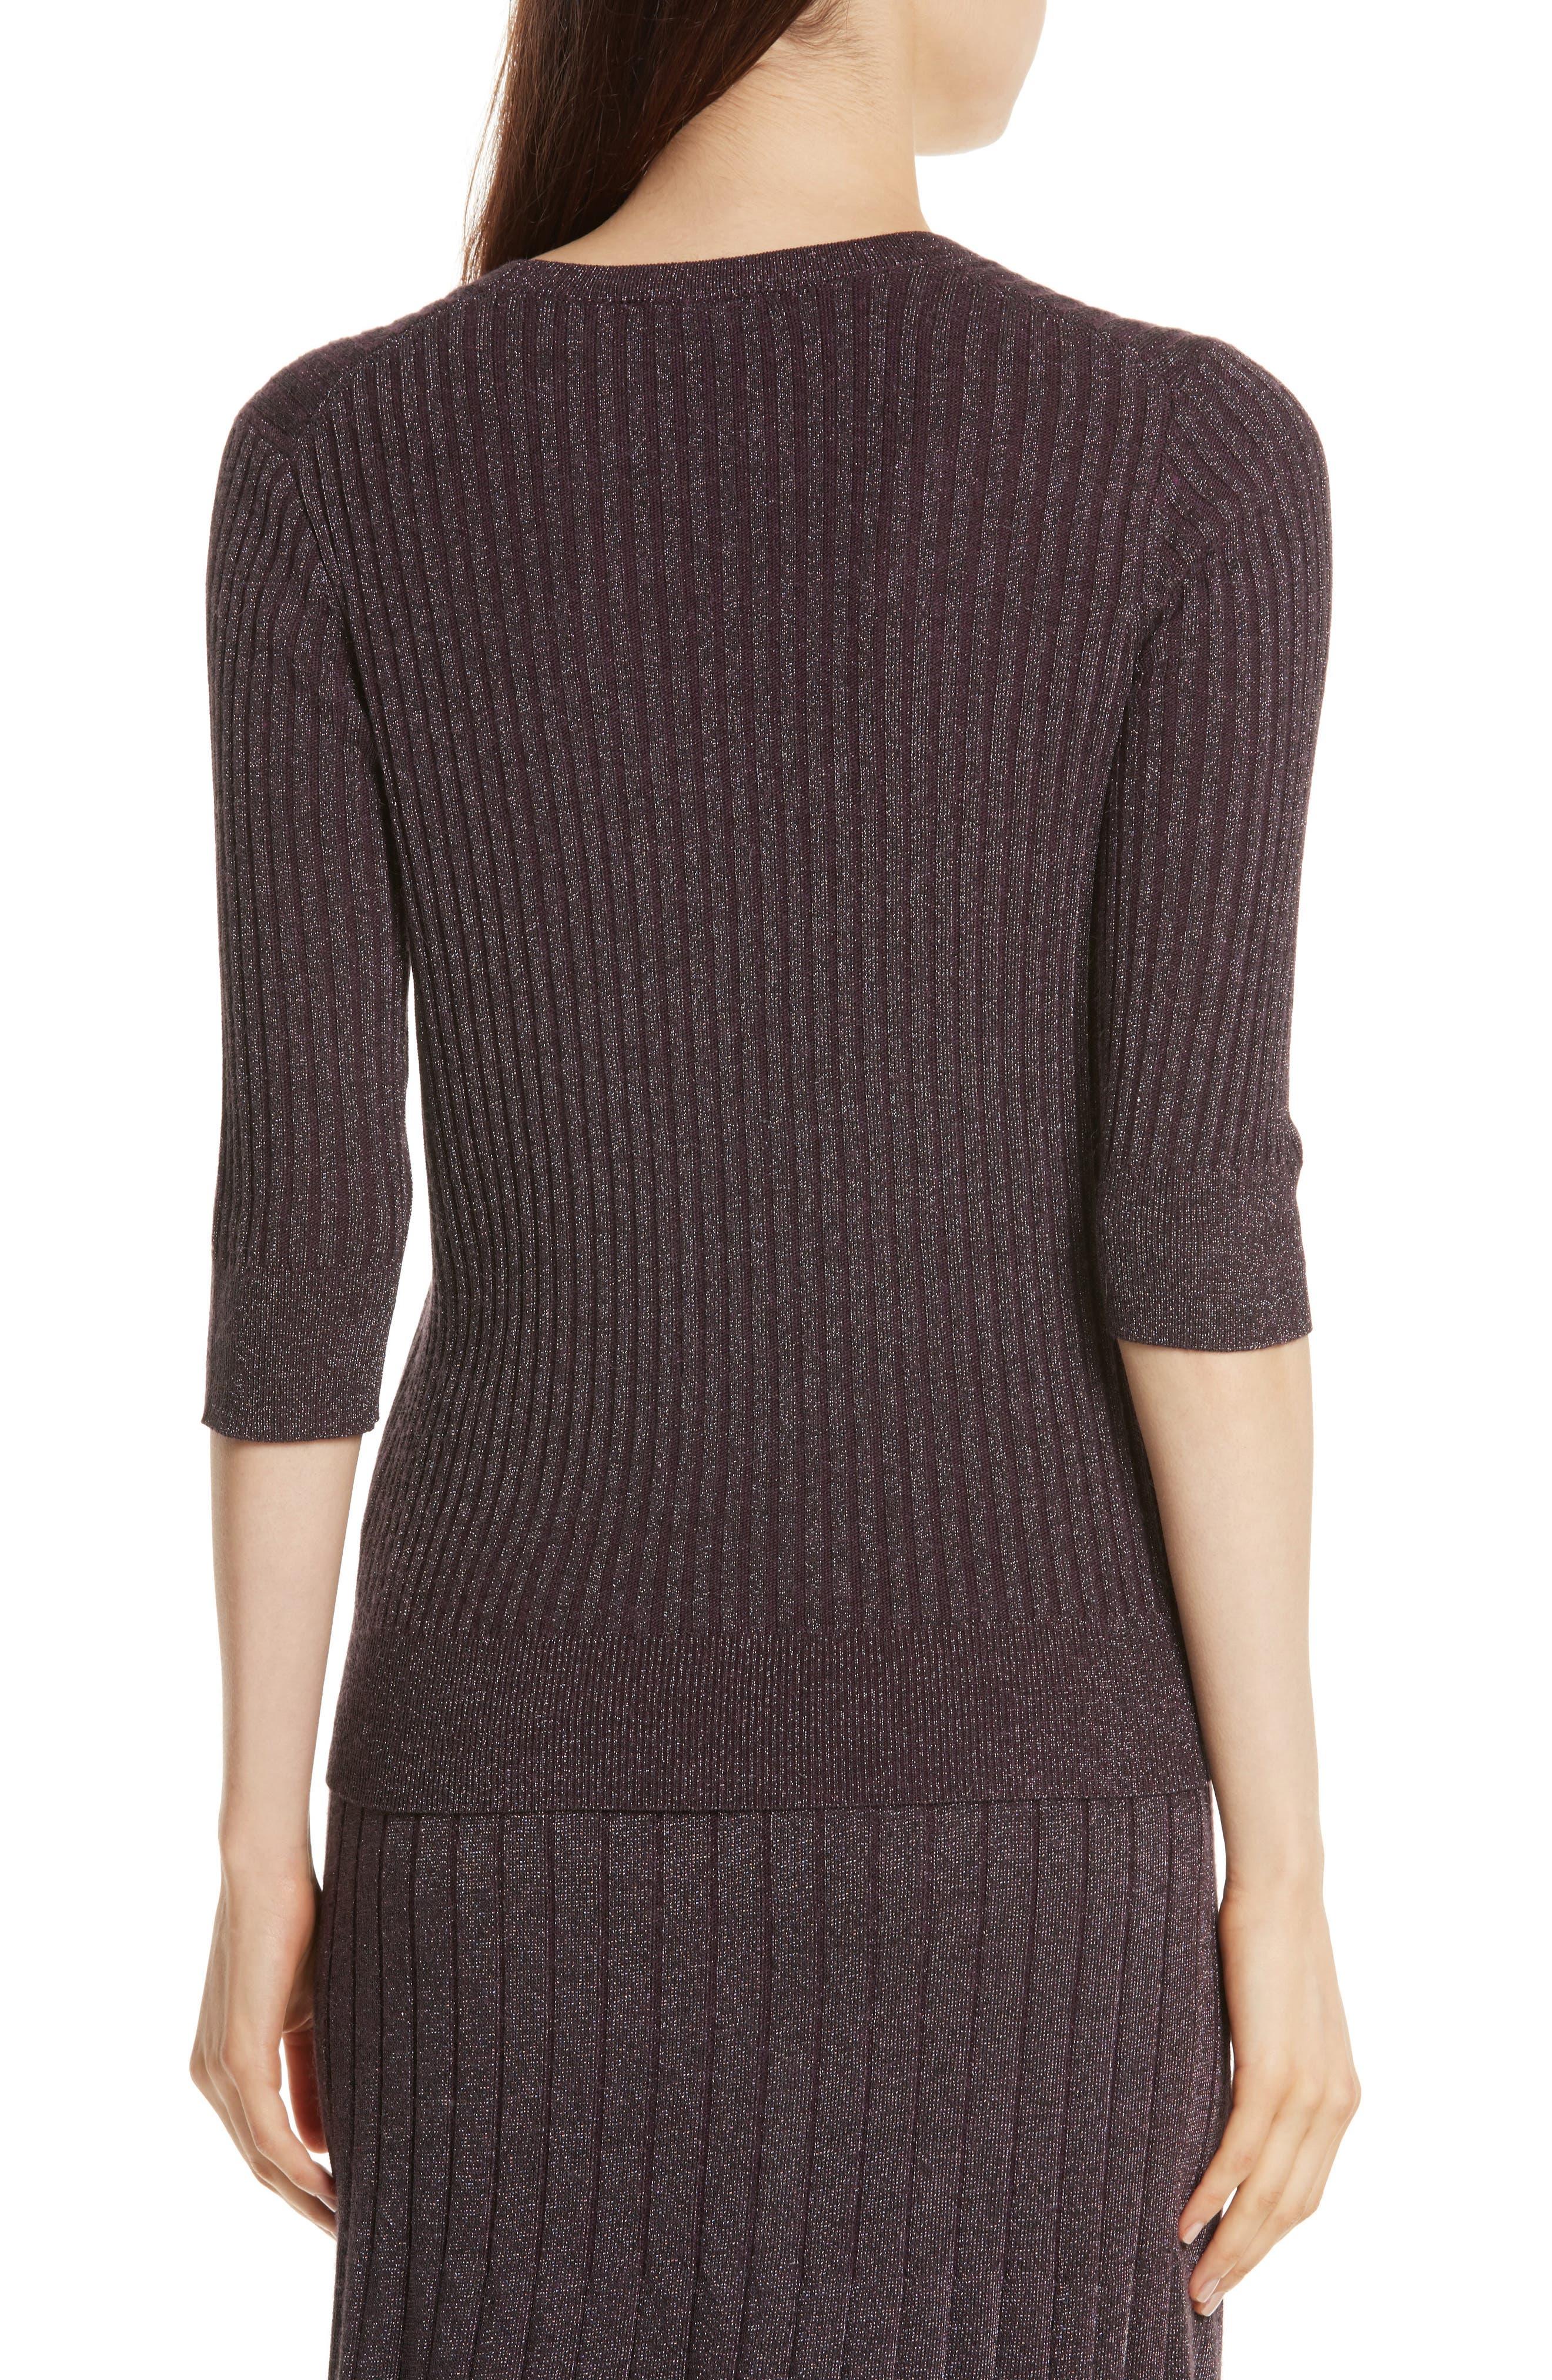 Alternate Image 2  - Rebecca Taylor Metallic Rib Sweater